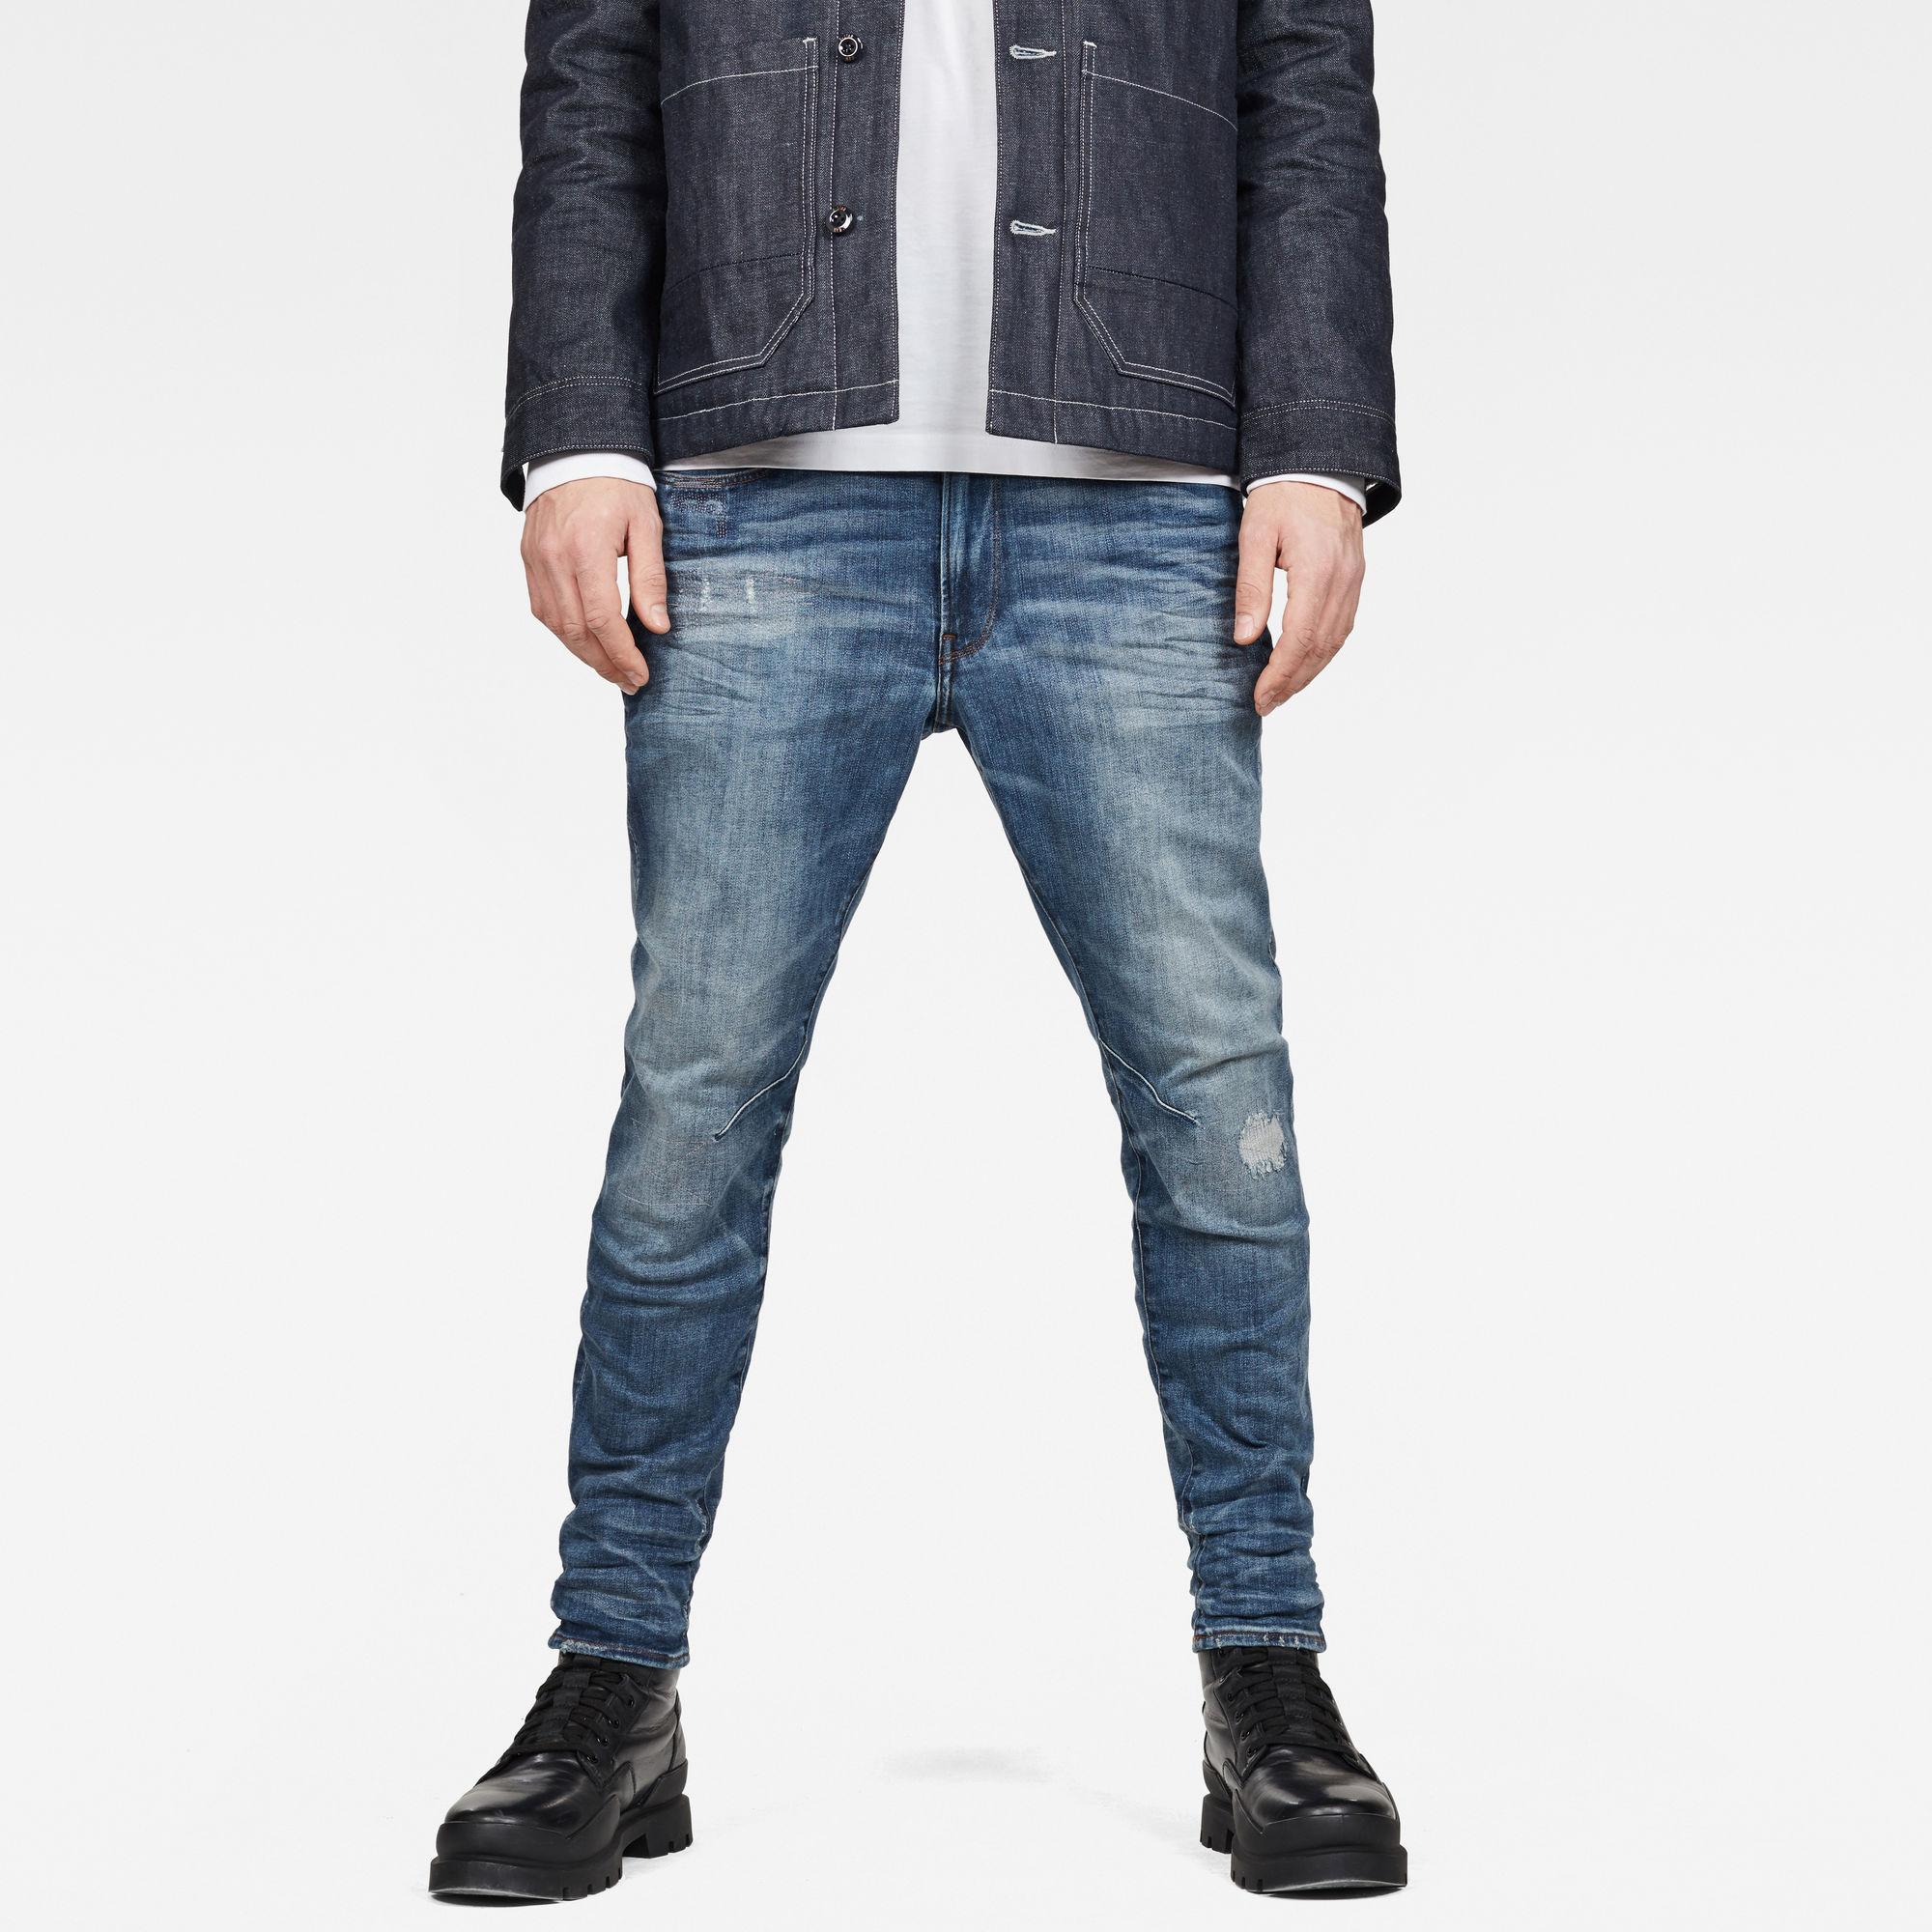 Image of G Star Raw D-Staq 3D Slim Jeans